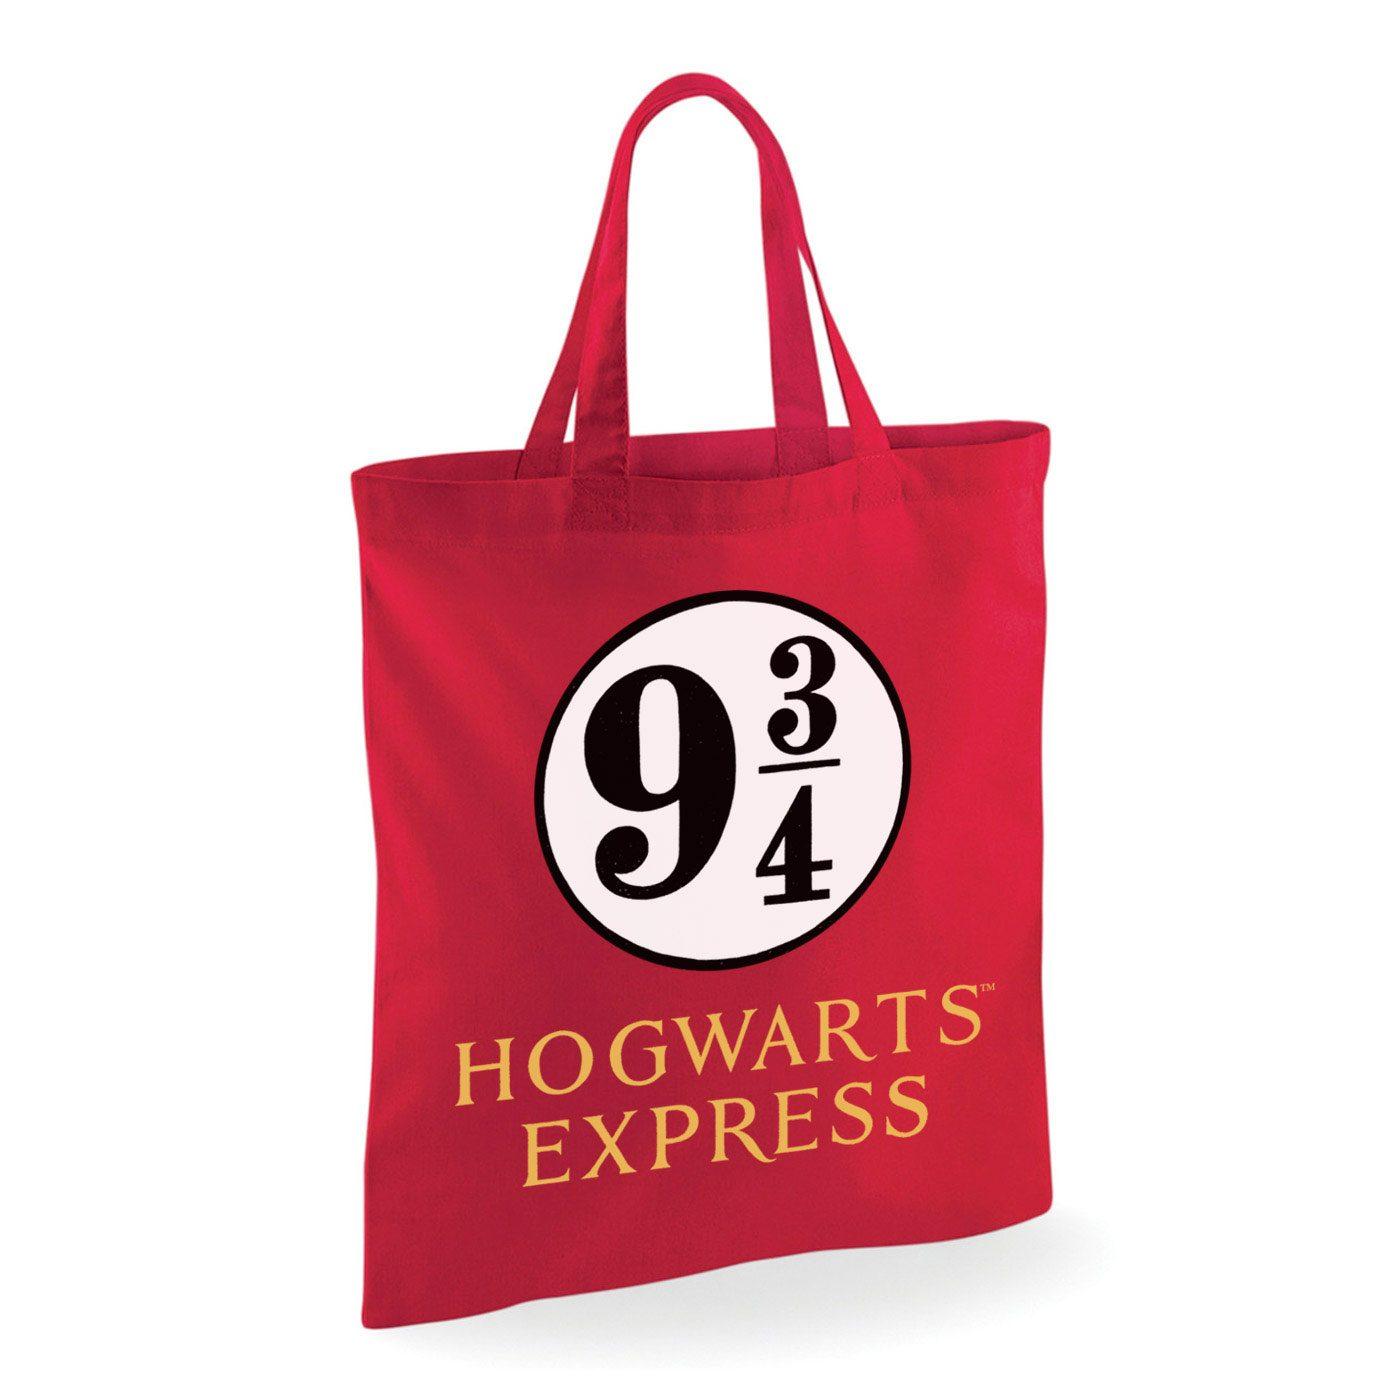 Harry Potter sac shopping poudlard express quai 3/4